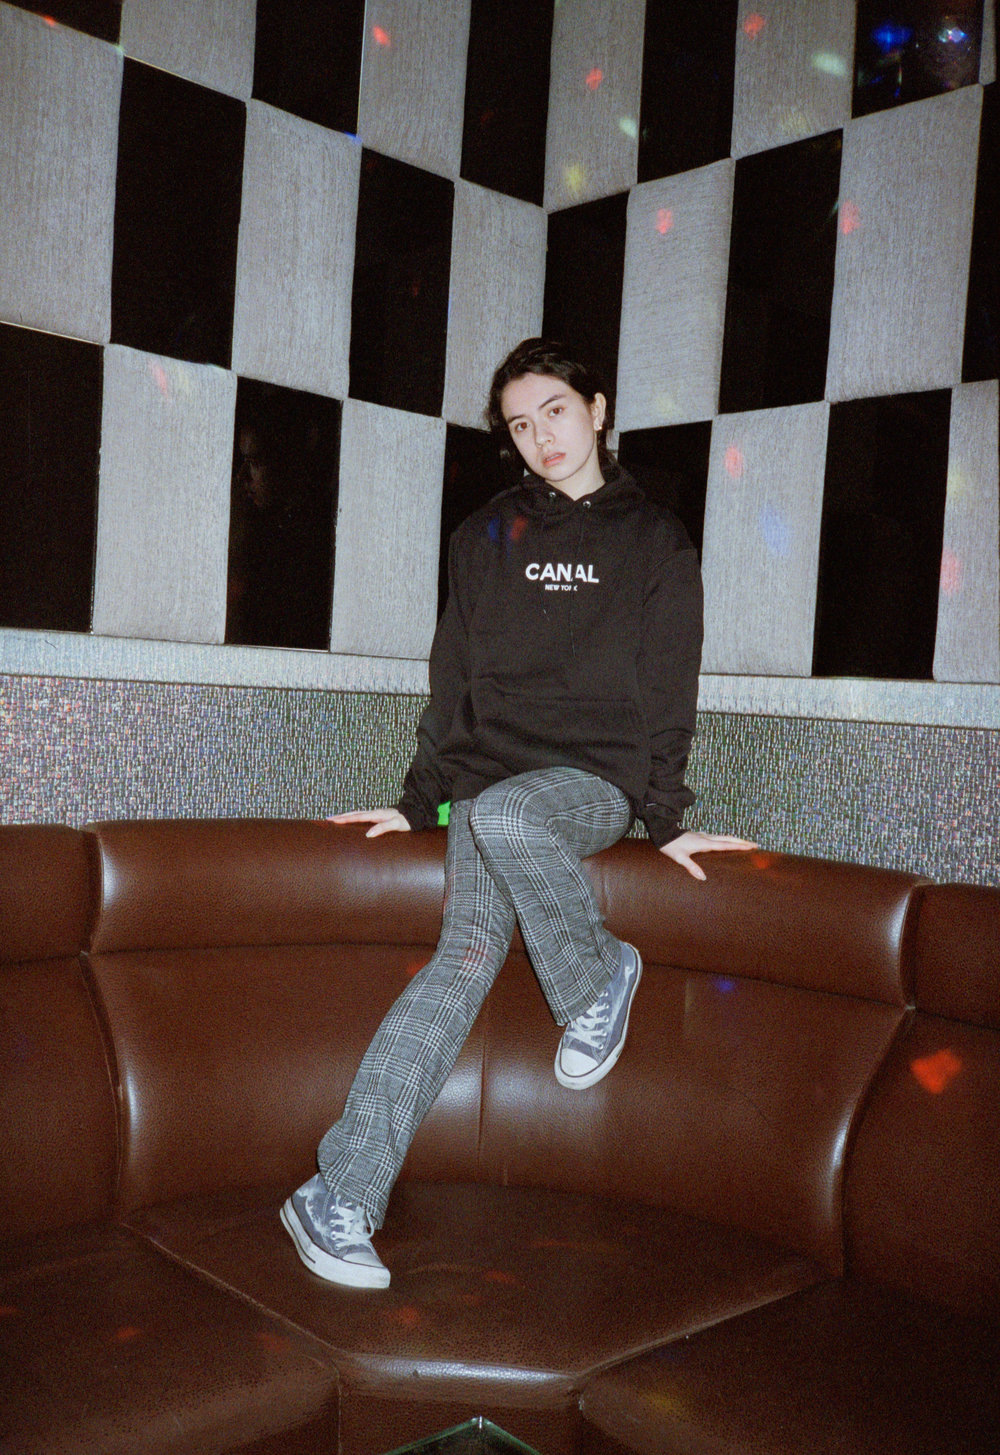 Canal Karaoke 03-15-2018 #23 E1.jpg